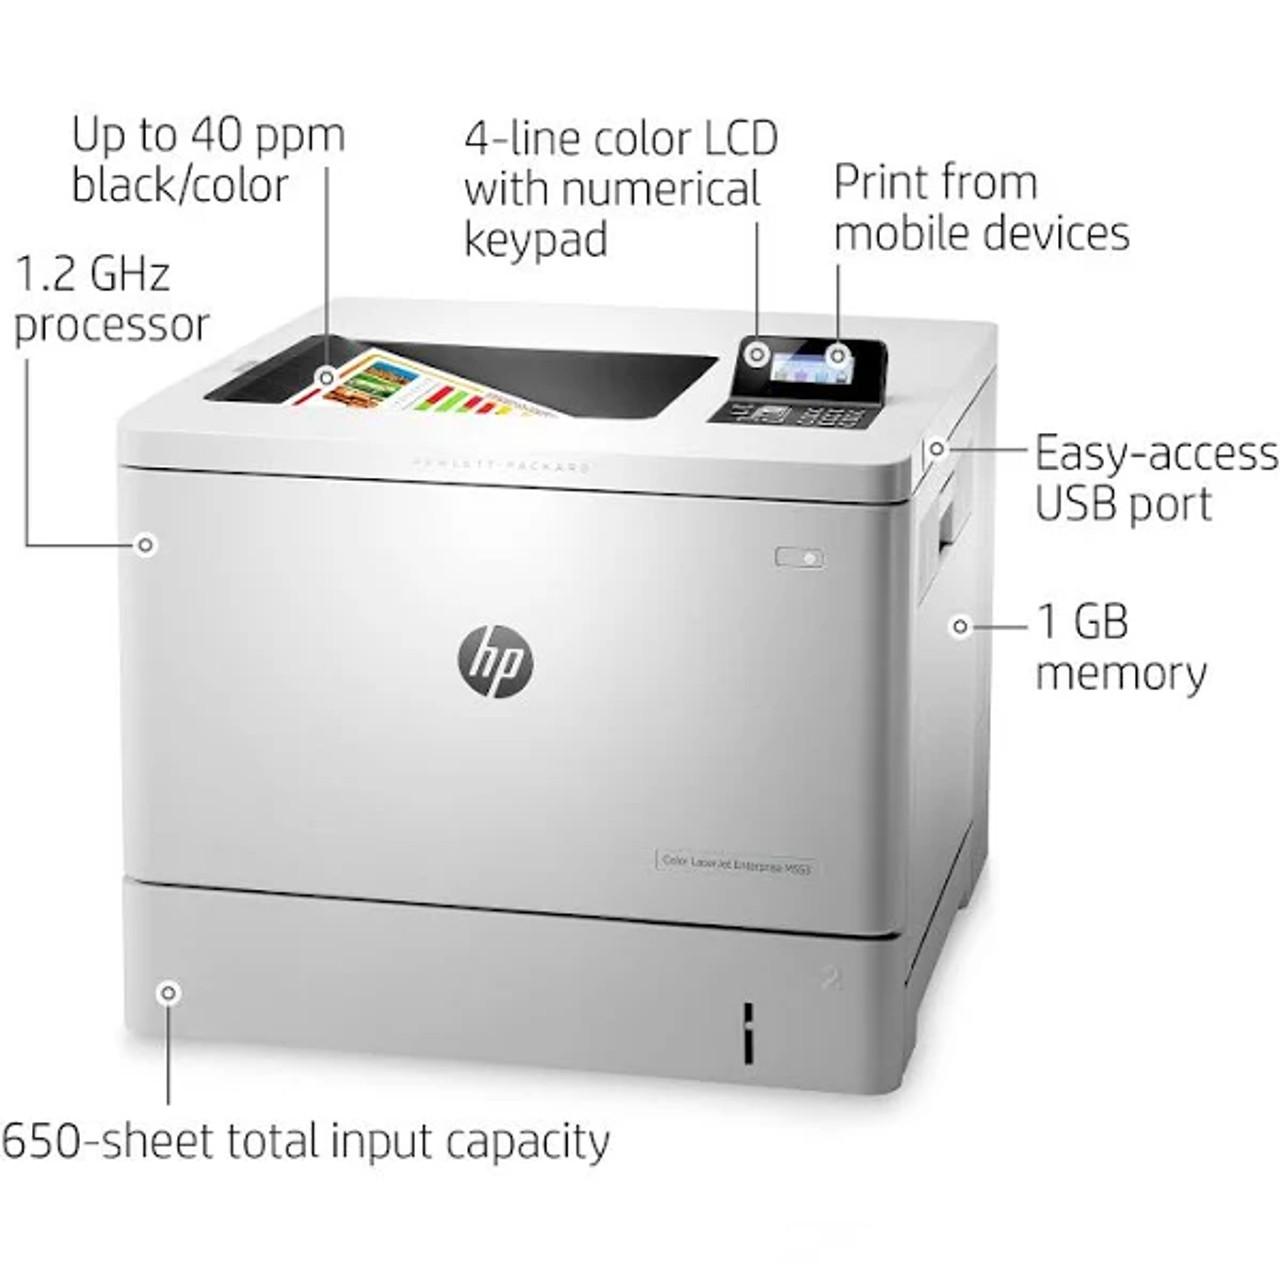 HP Color LaserJet Enterprise M553n Laser Printer Features